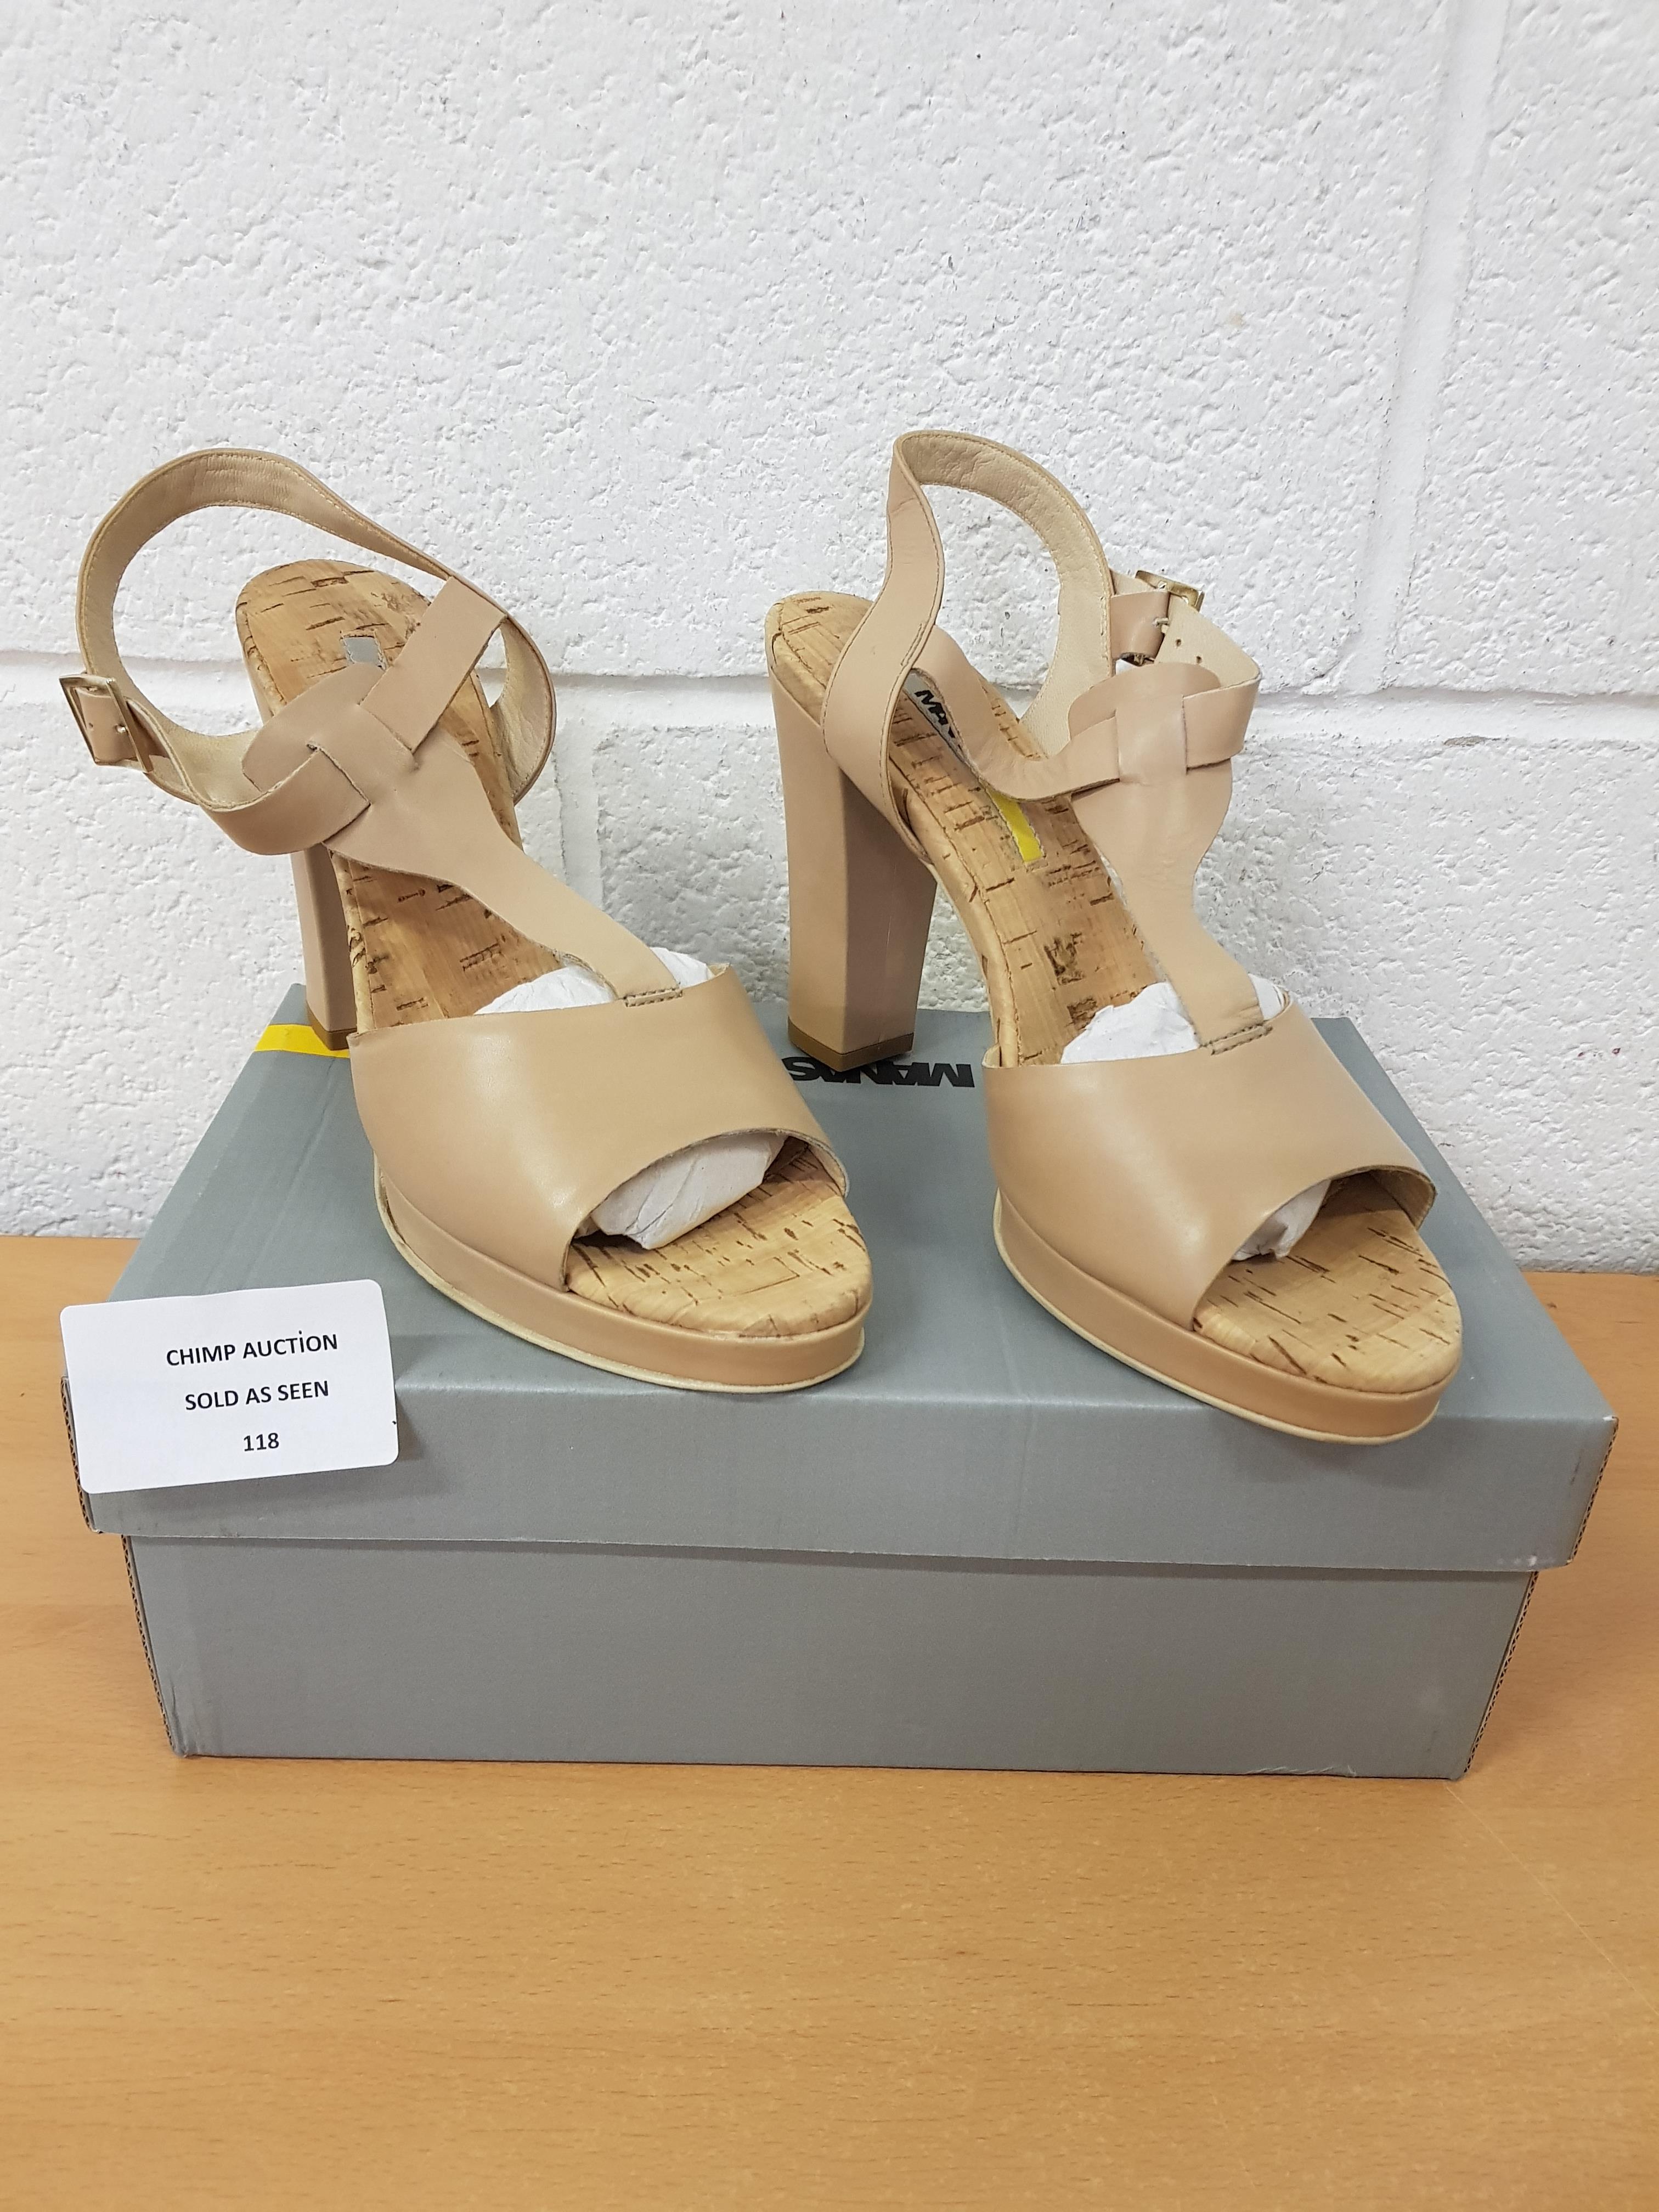 Lot 118 - Manas ladies shoes EU 42